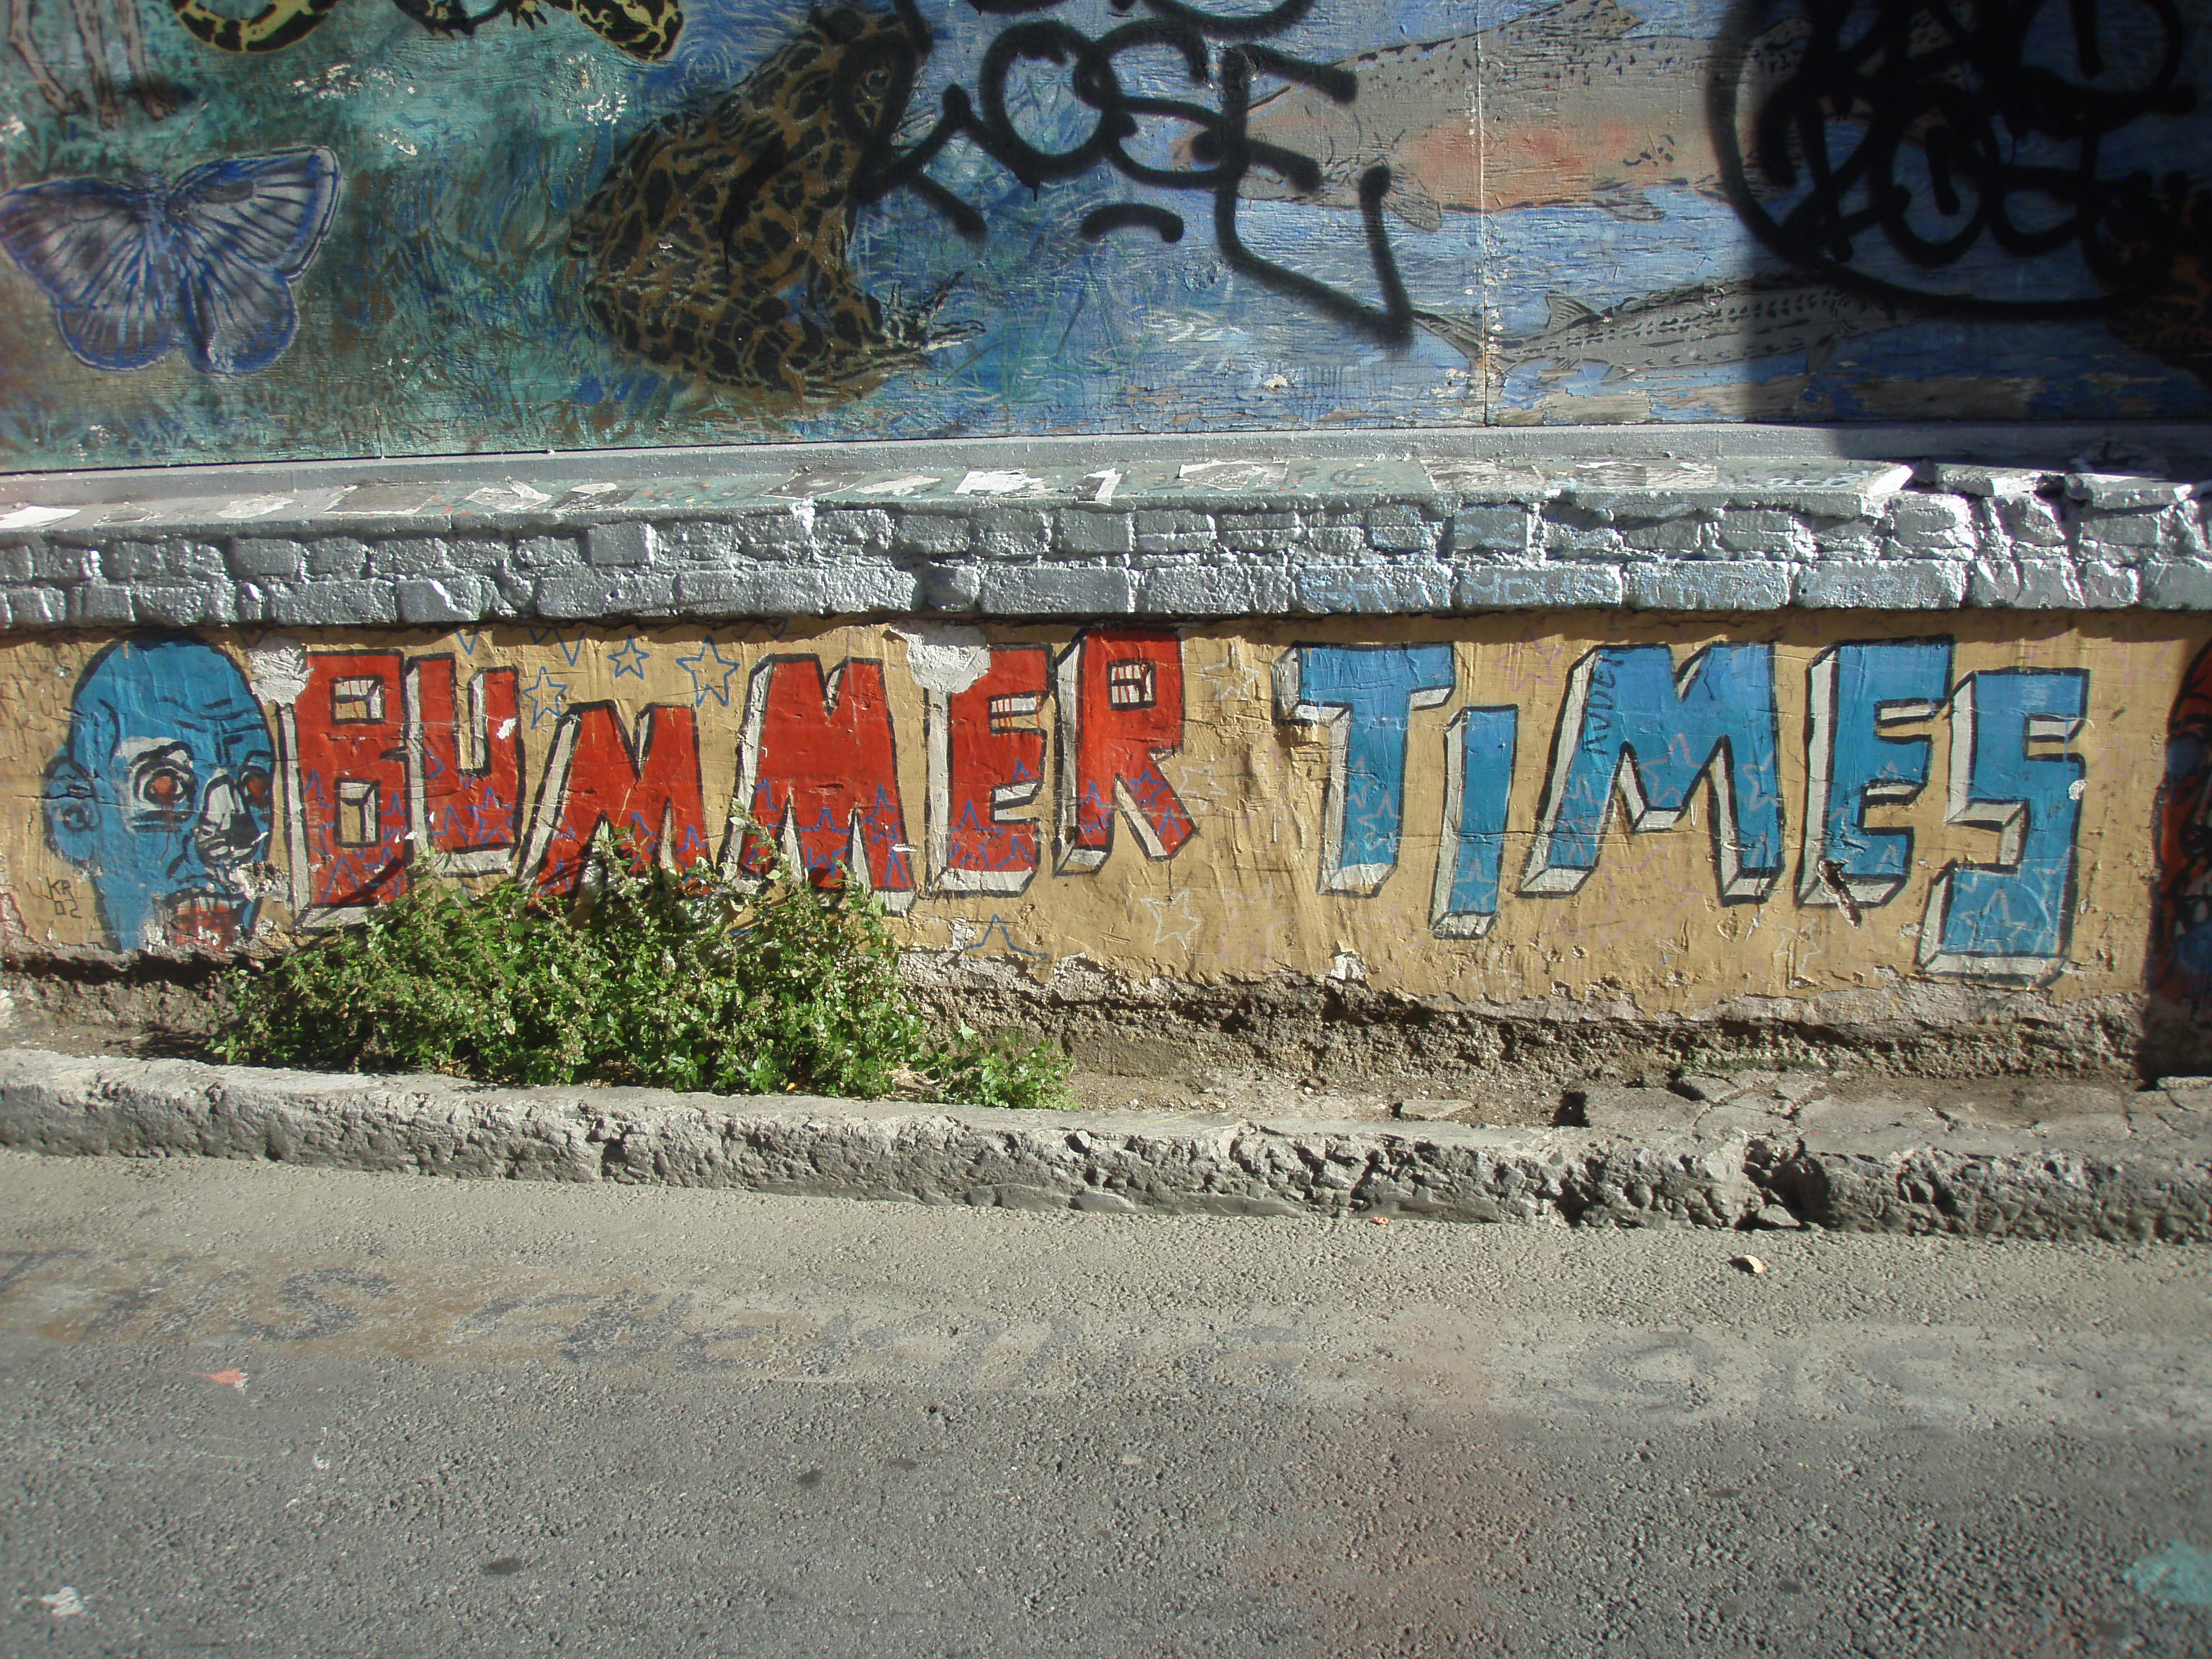 Graffiti over art?